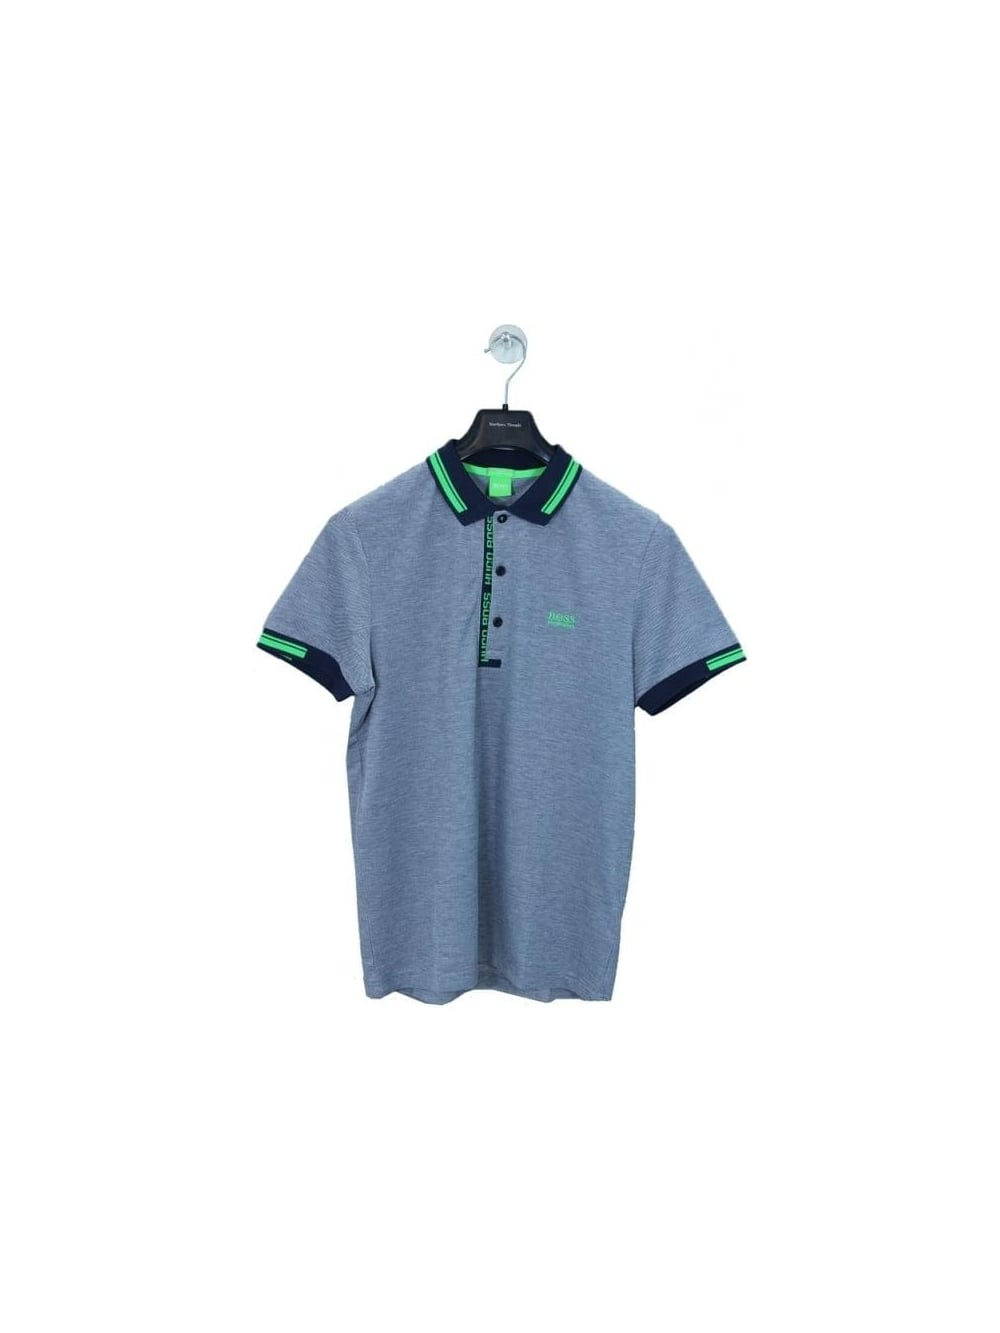 ff46b30ae4837 Hugo Boss Green Paule 4 Polo T Shirt